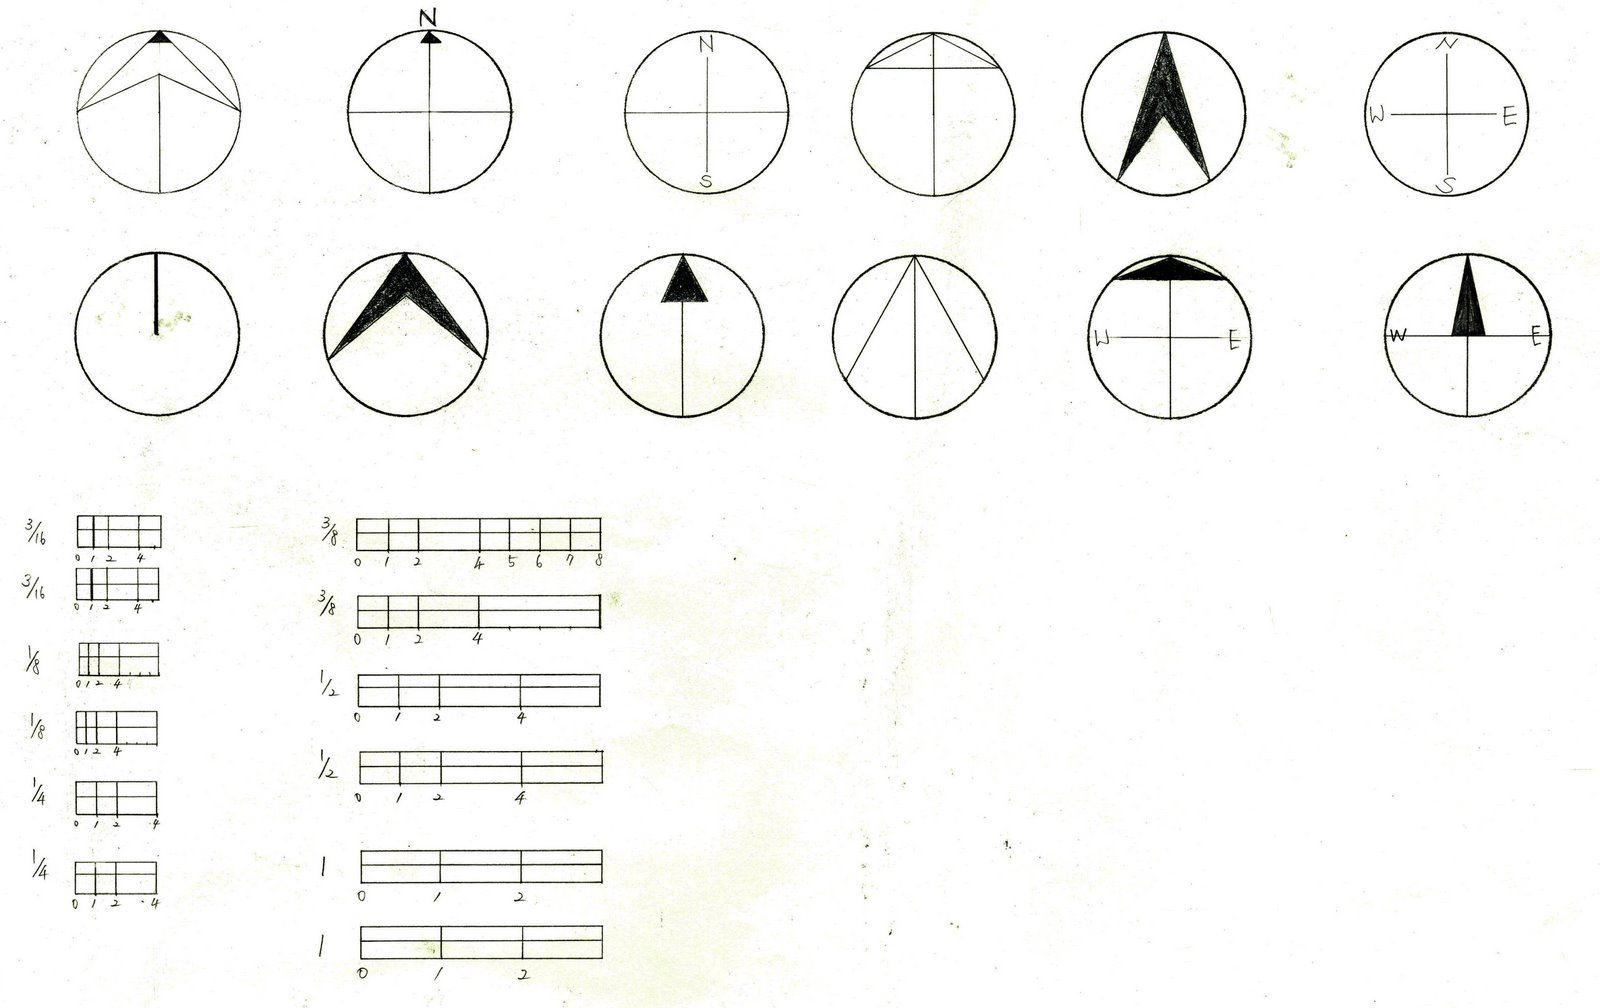 Interior Design North Arrows And Scalse